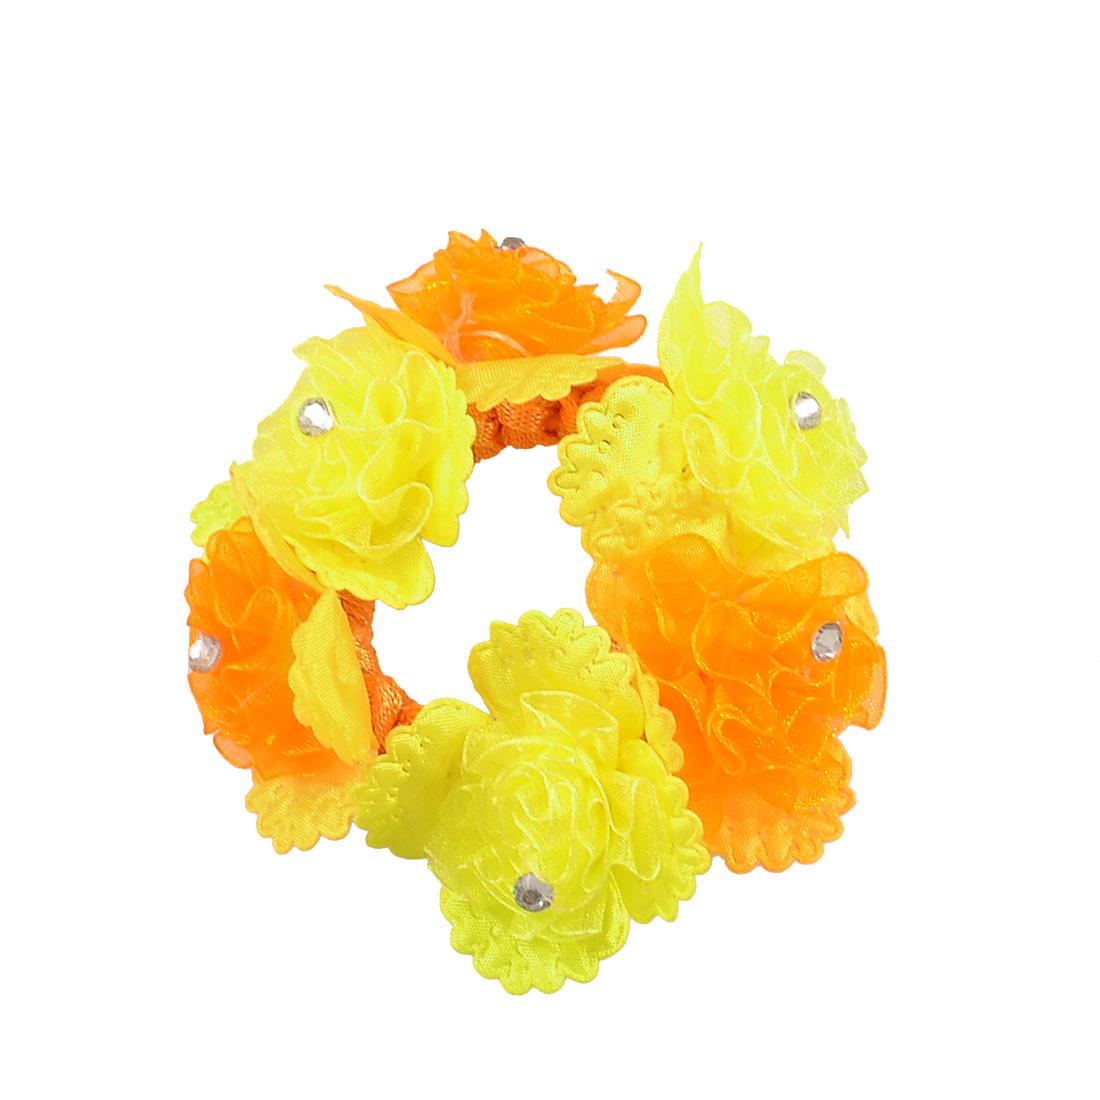 Yellow Orange Flower Design Rhinestone Decor Stretchy Fabric Hair Tie Hairdress Band